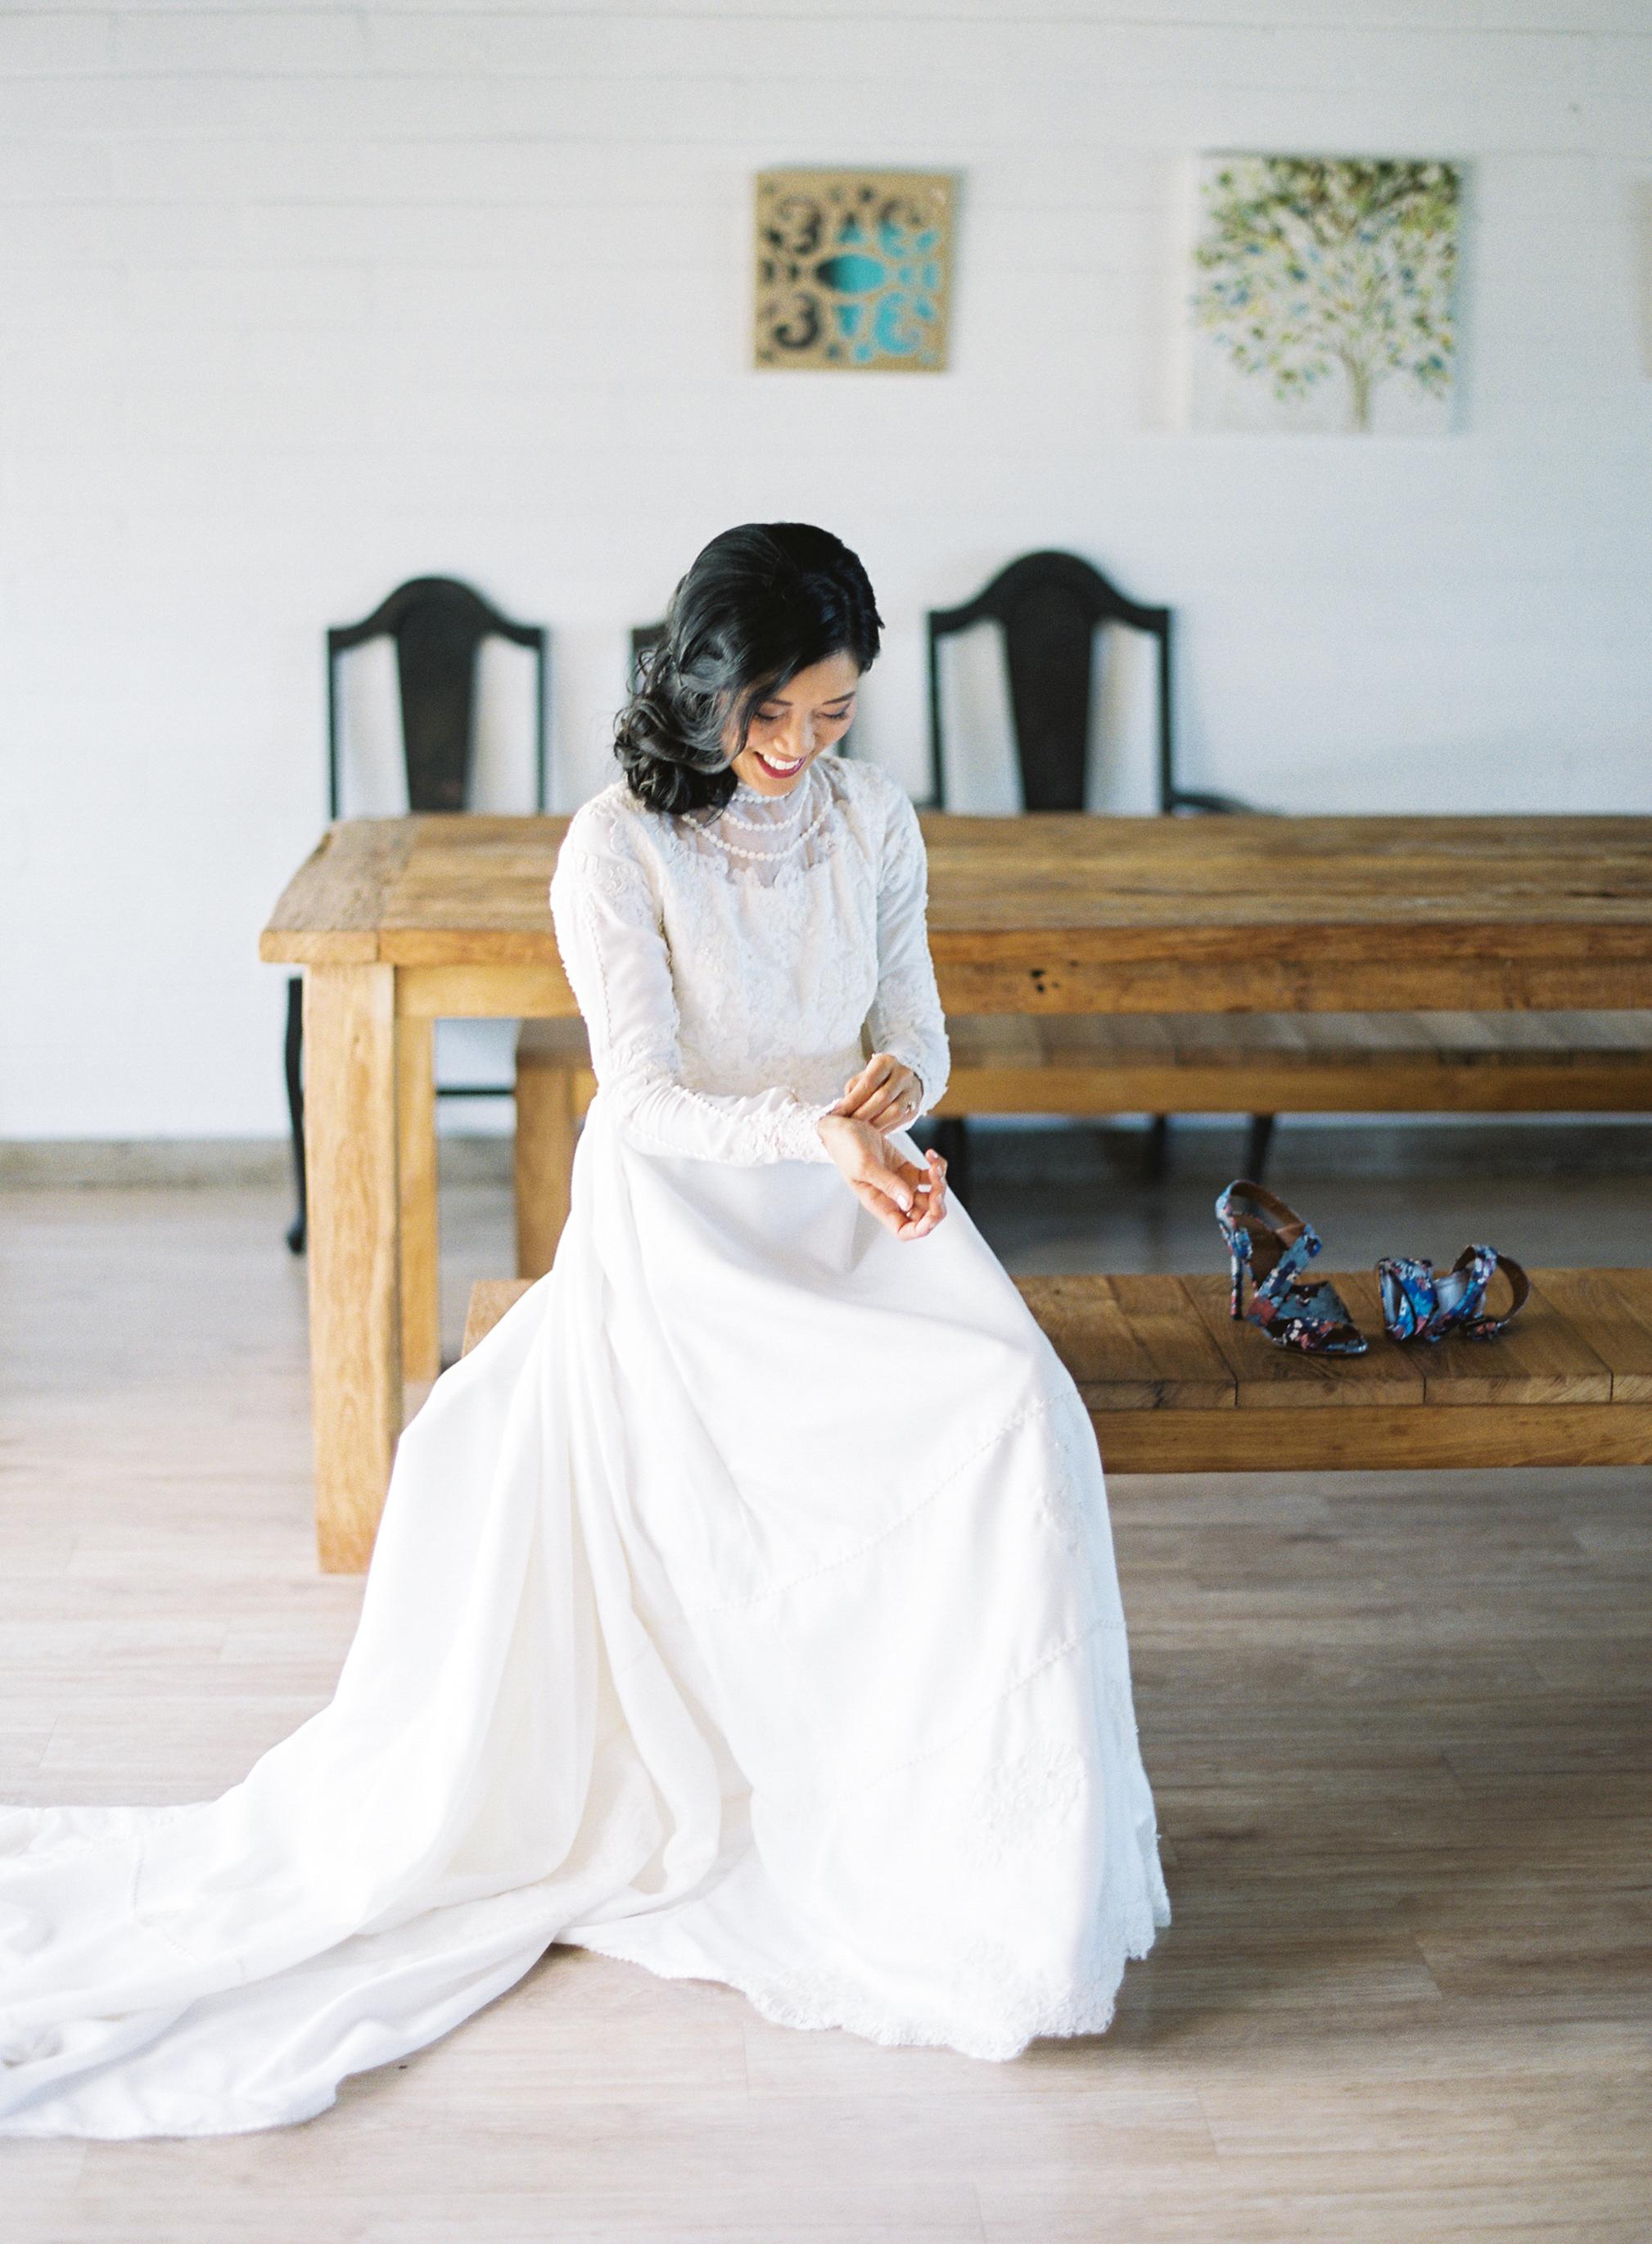 Bride buttons sleeve of dress